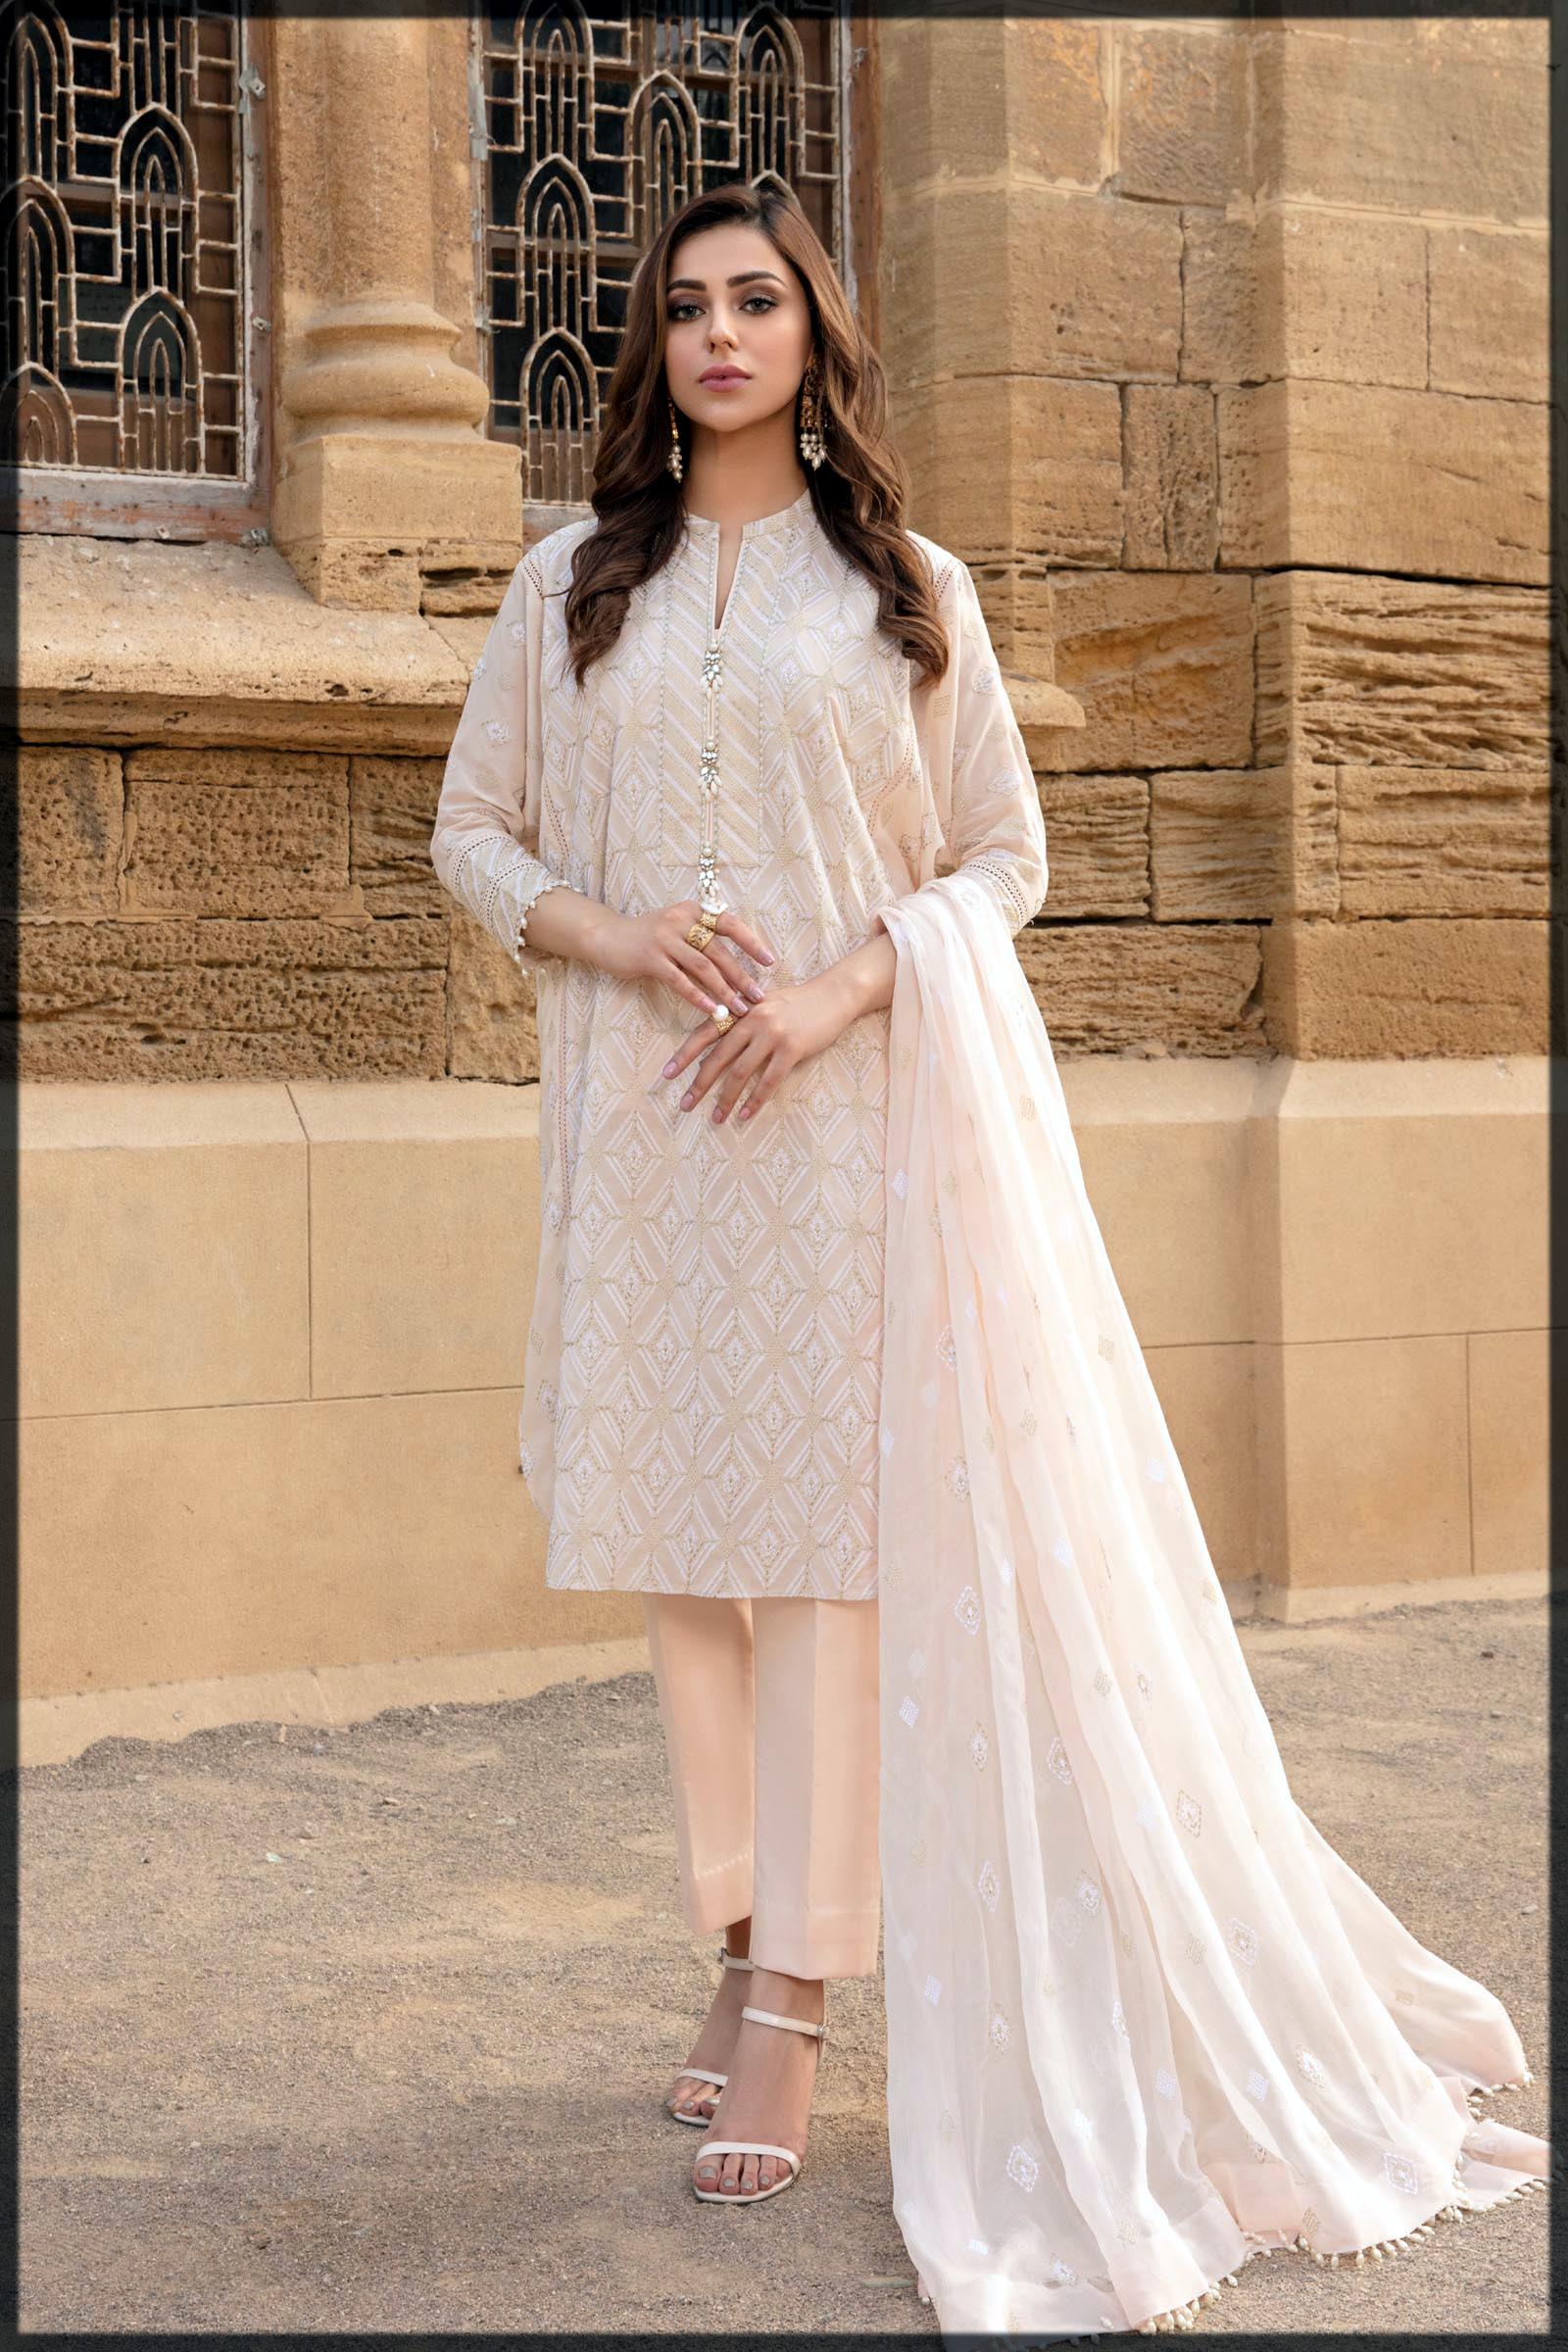 classy formal dress by bareeze